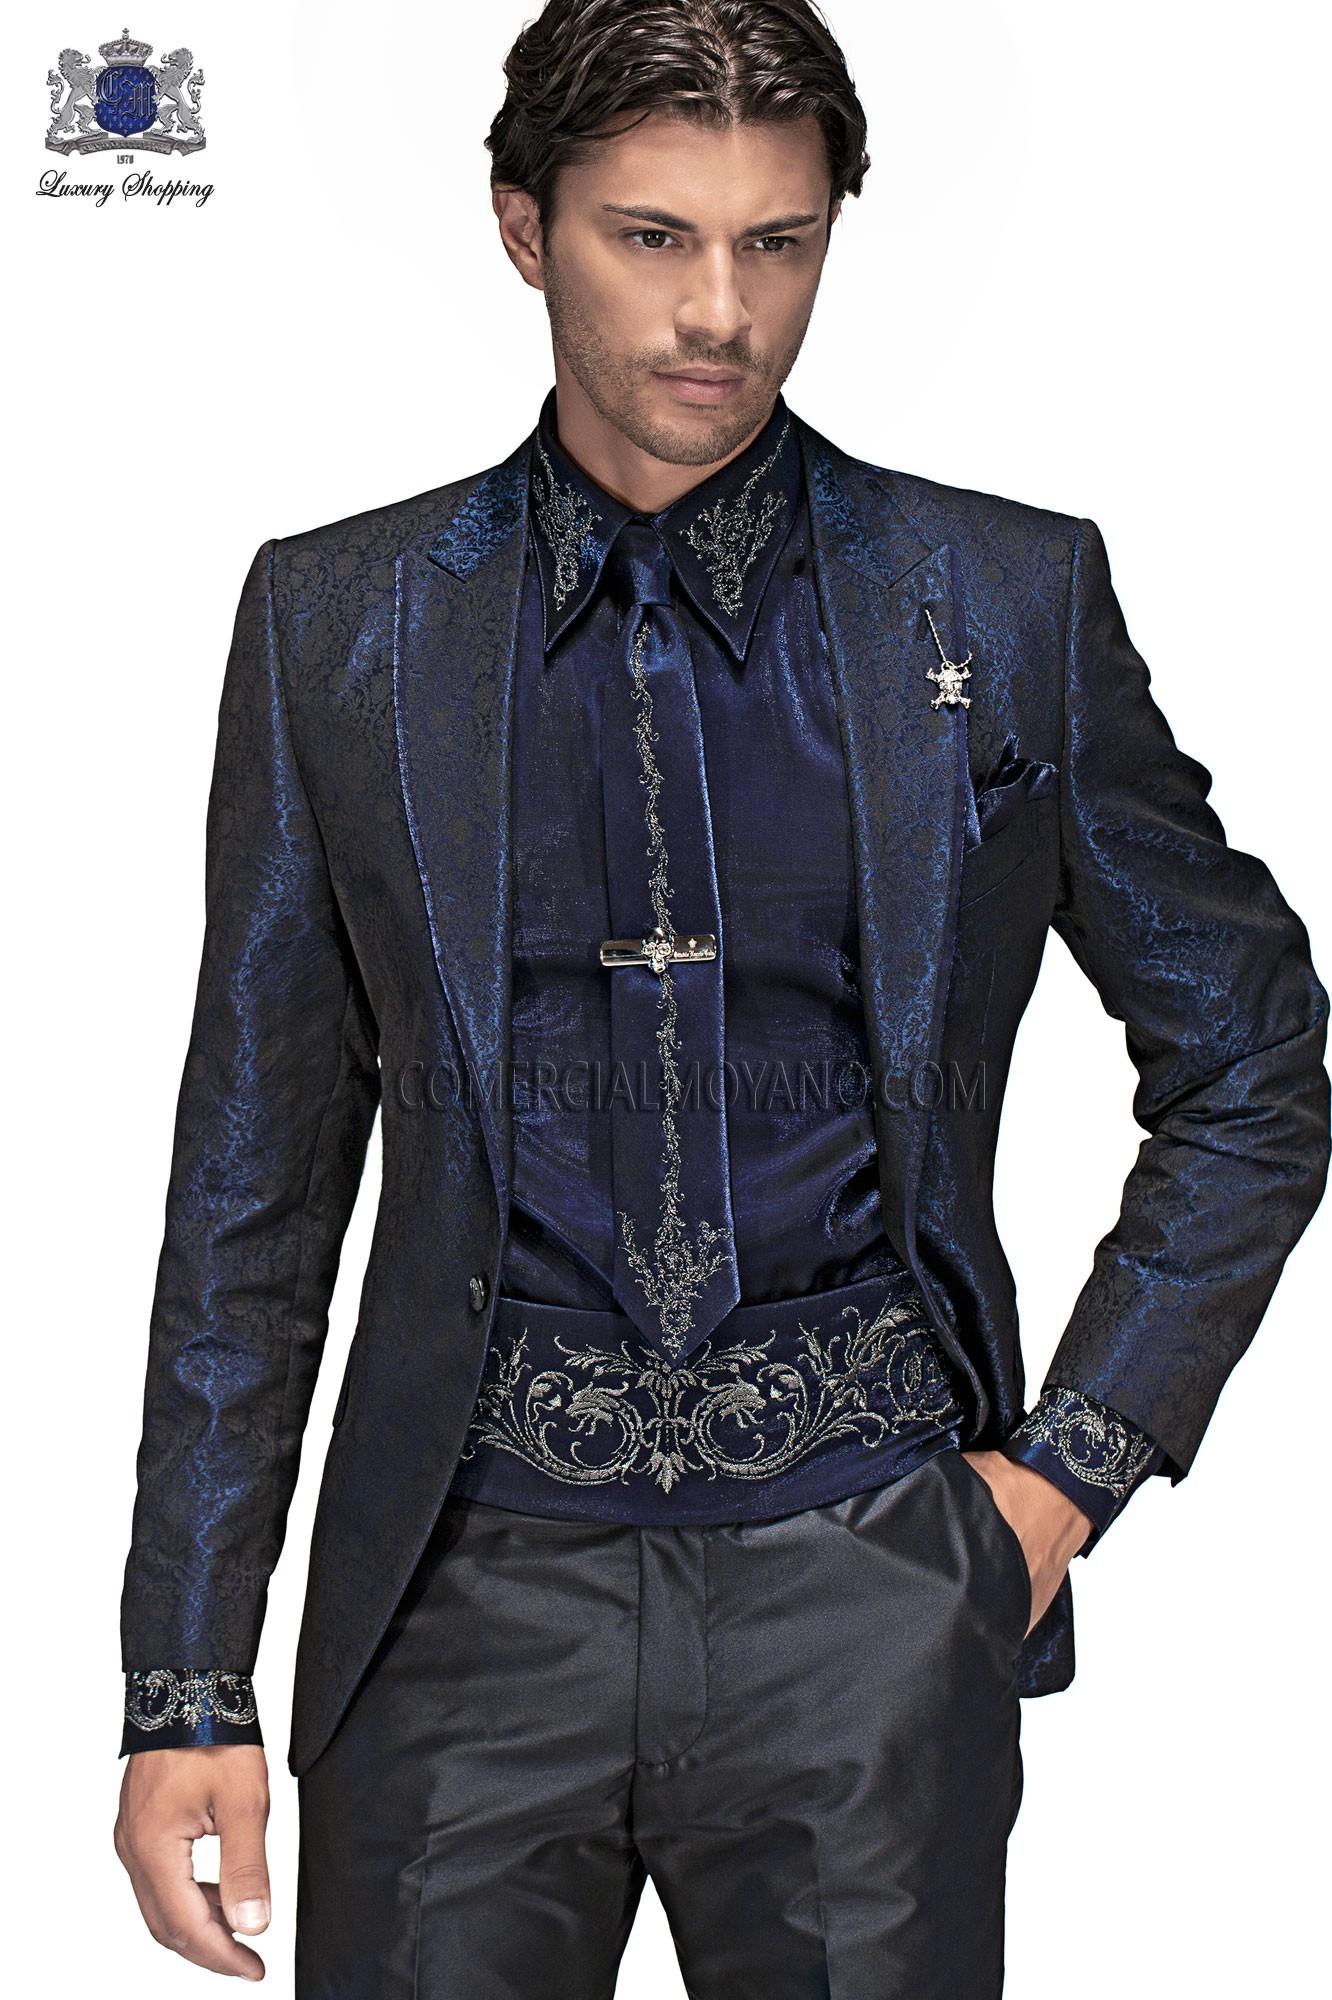 Emotion blue men wedding suit model 60369 Ottavio Nuccio Gala